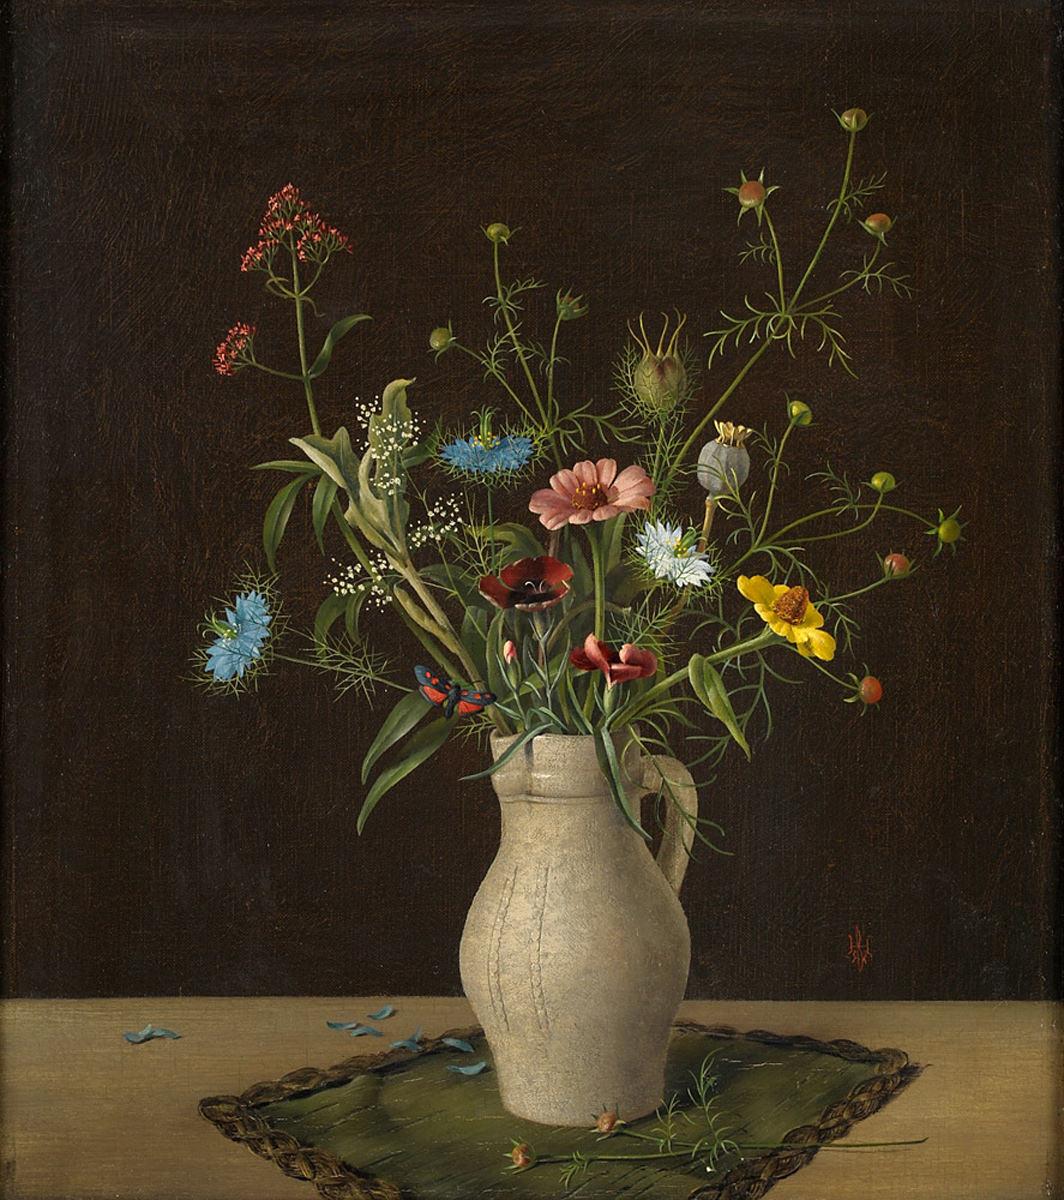 Herbert Böttger. Blumen im Tonkrug. 1932. Öl / Leinwand. 44,5 x 38,5cm